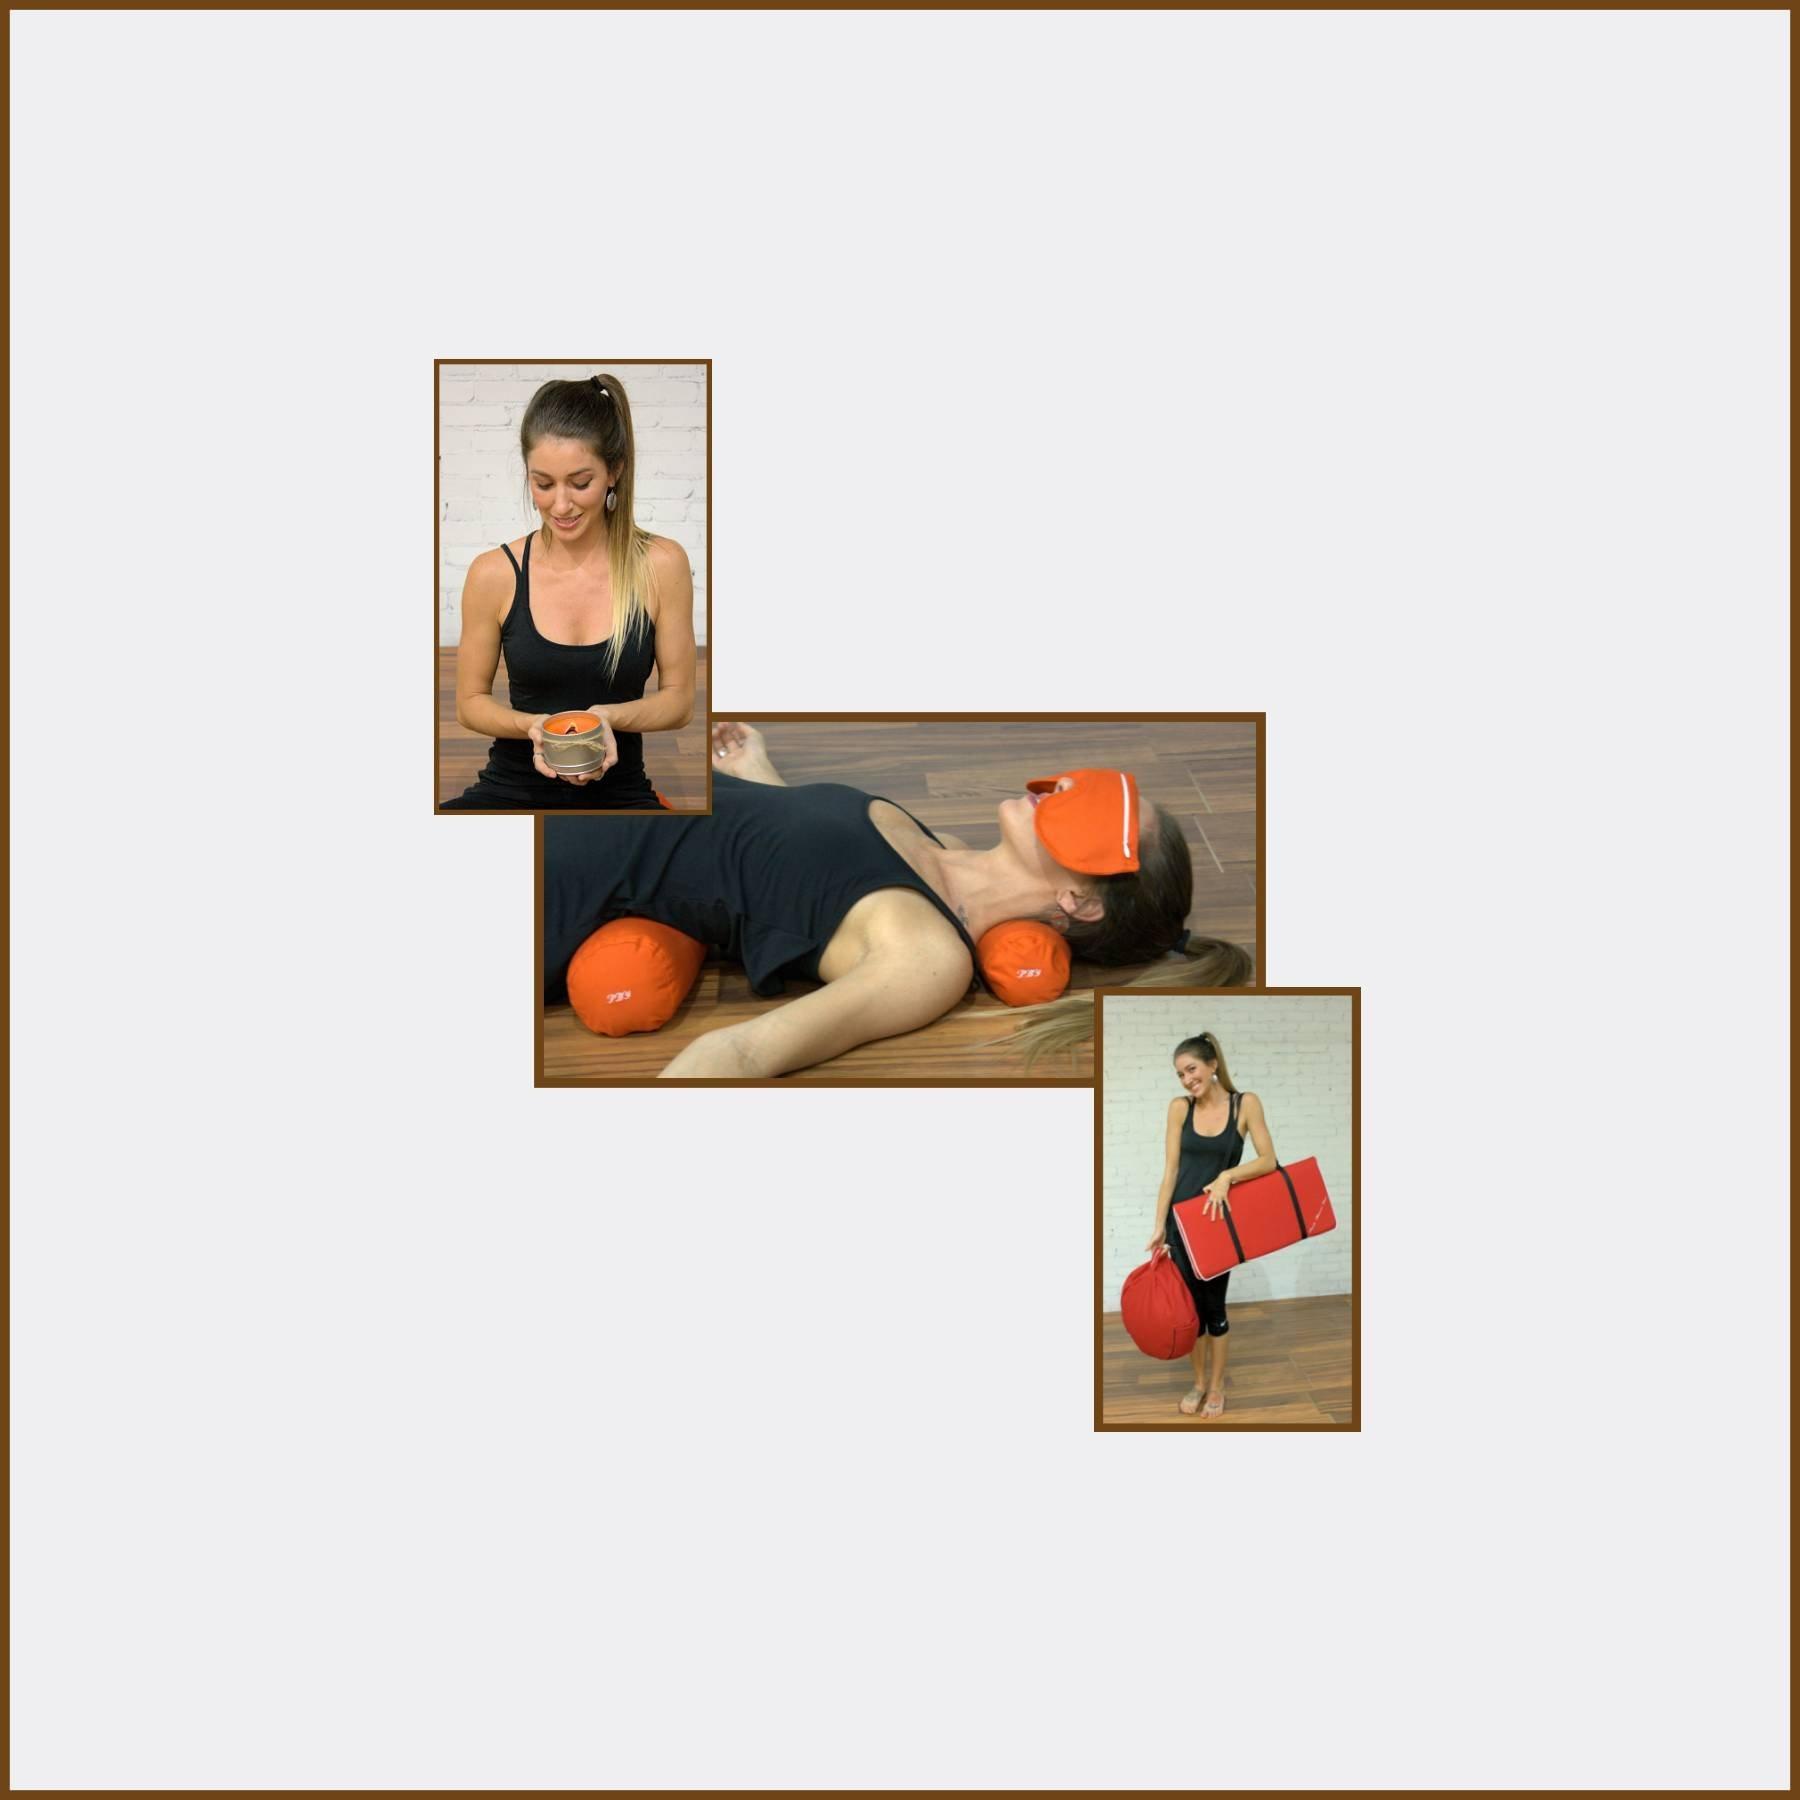 7 Piece Restorative Yoga Set -Zafu Meditation Pillow, Zabuton Cushion, Eye Pillow, Neck Bolster, Back Bolster, Soy Candle, and Strap by Peach Blossom Yoga (Image #2)